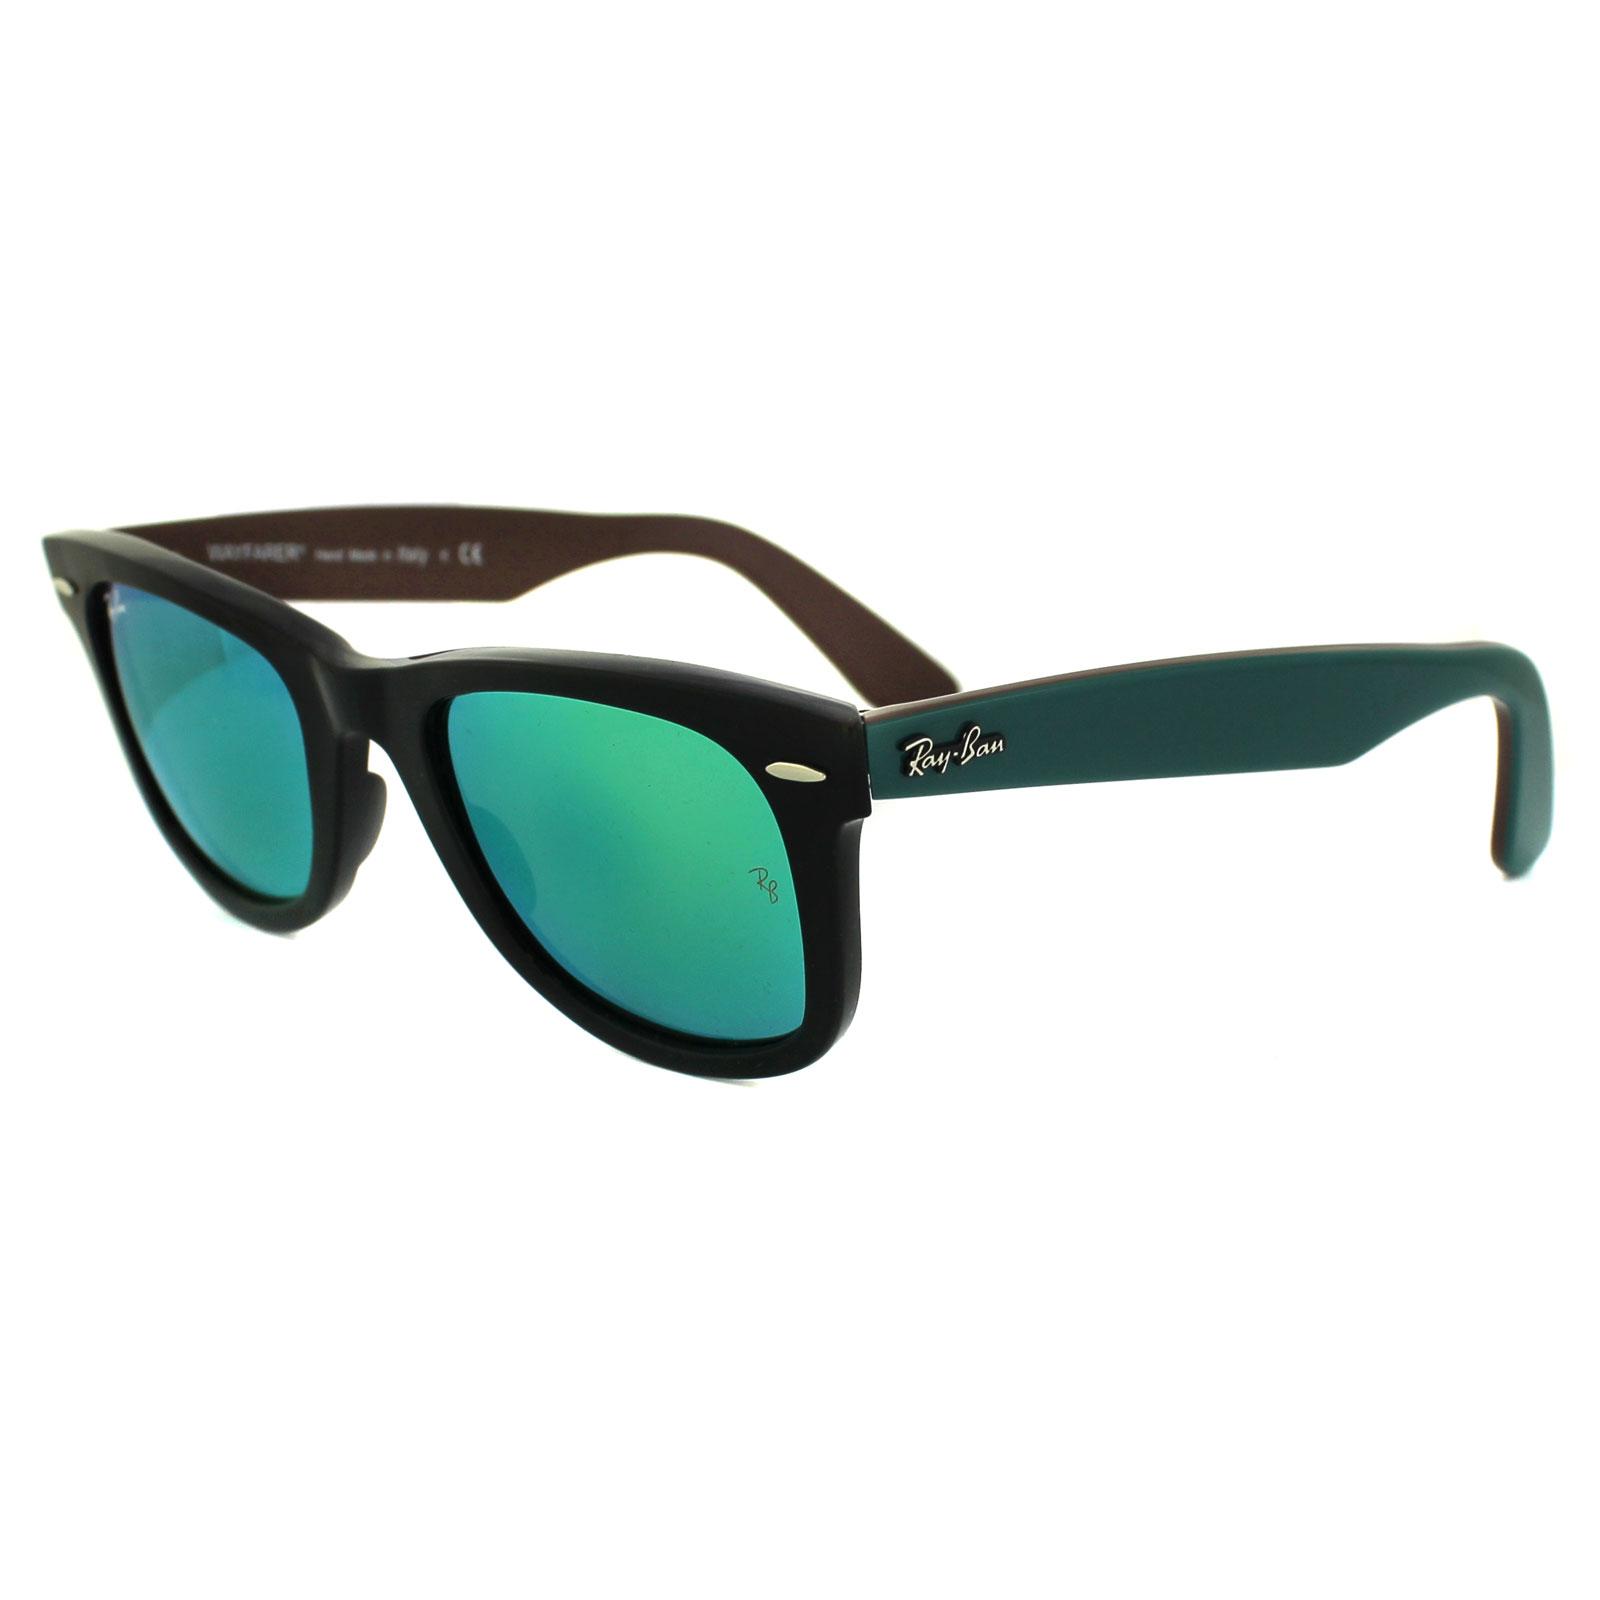 ray ban sunglasses wayfarer 2140 117519 bicolor black with green ebay. Black Bedroom Furniture Sets. Home Design Ideas